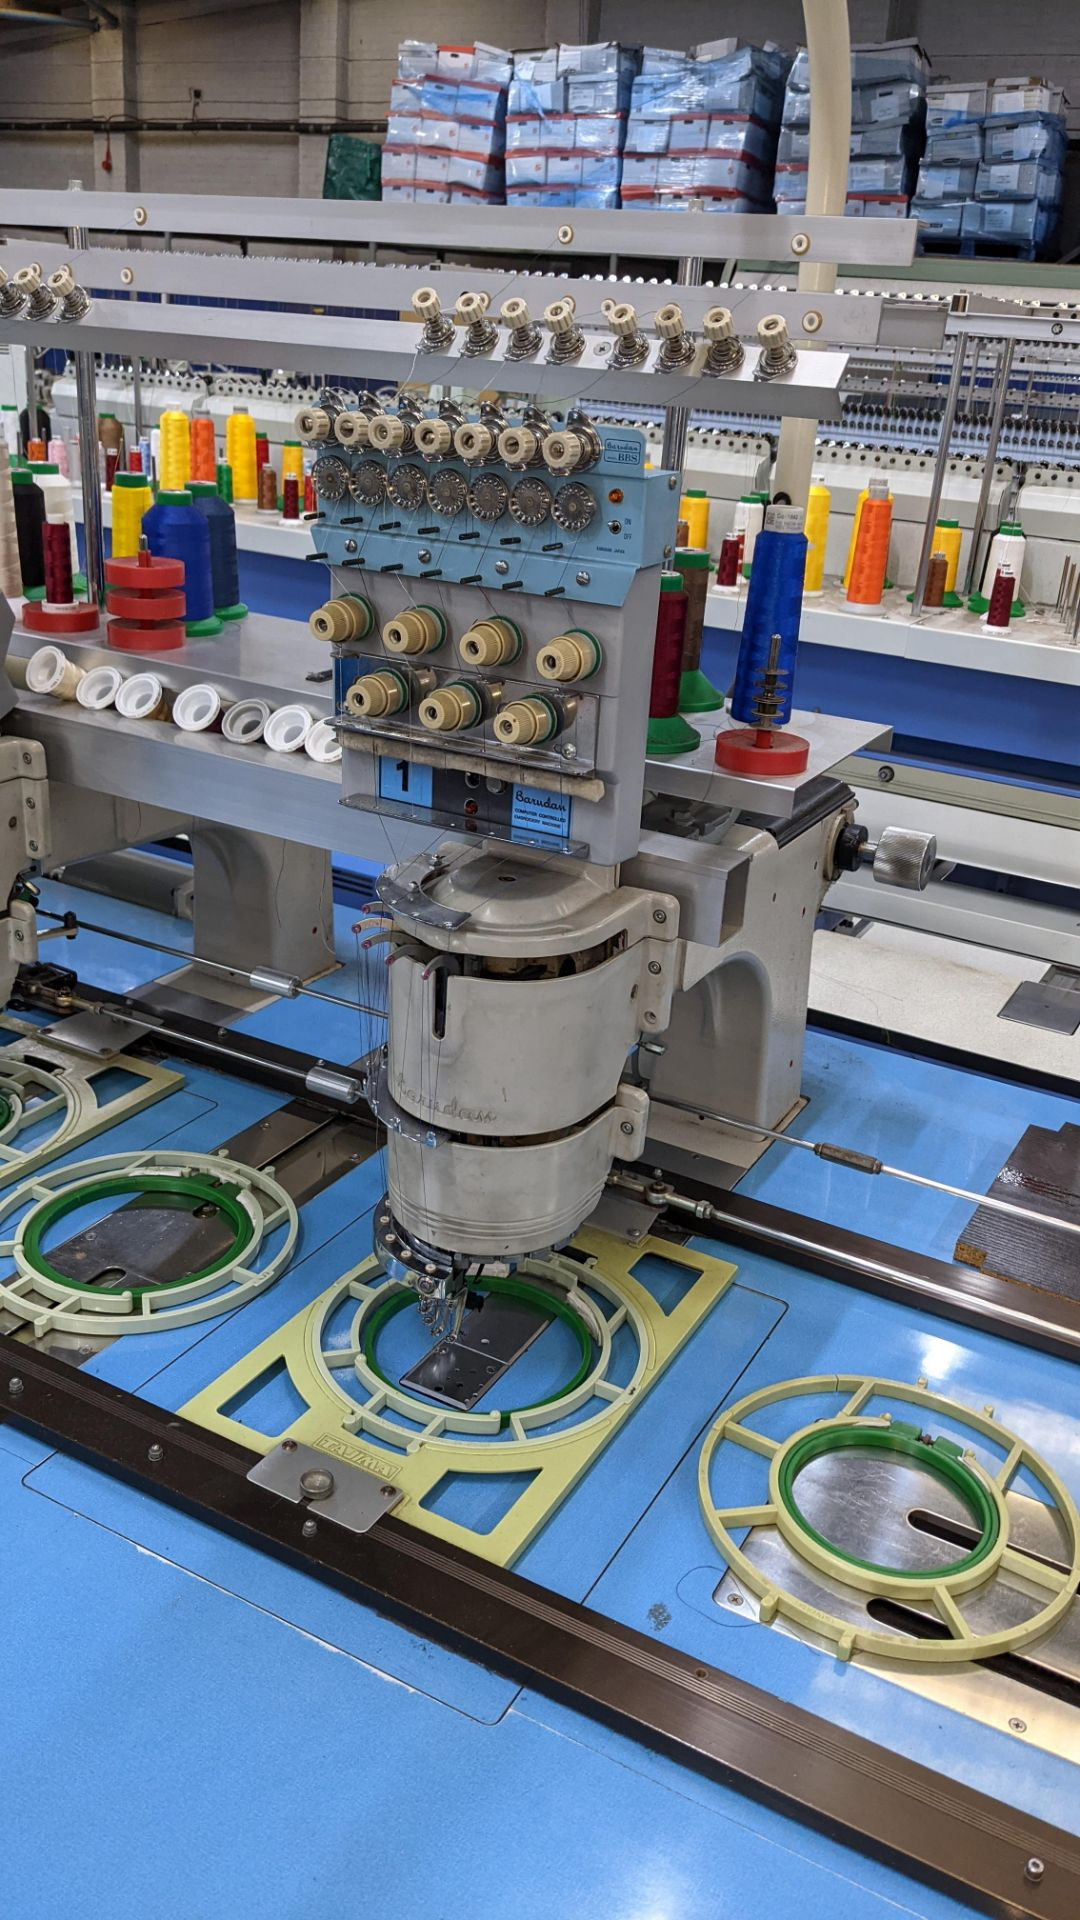 Barudan 4 head embroidery machine, model BEAT 804TYS, 7 needles per head - Image 10 of 24